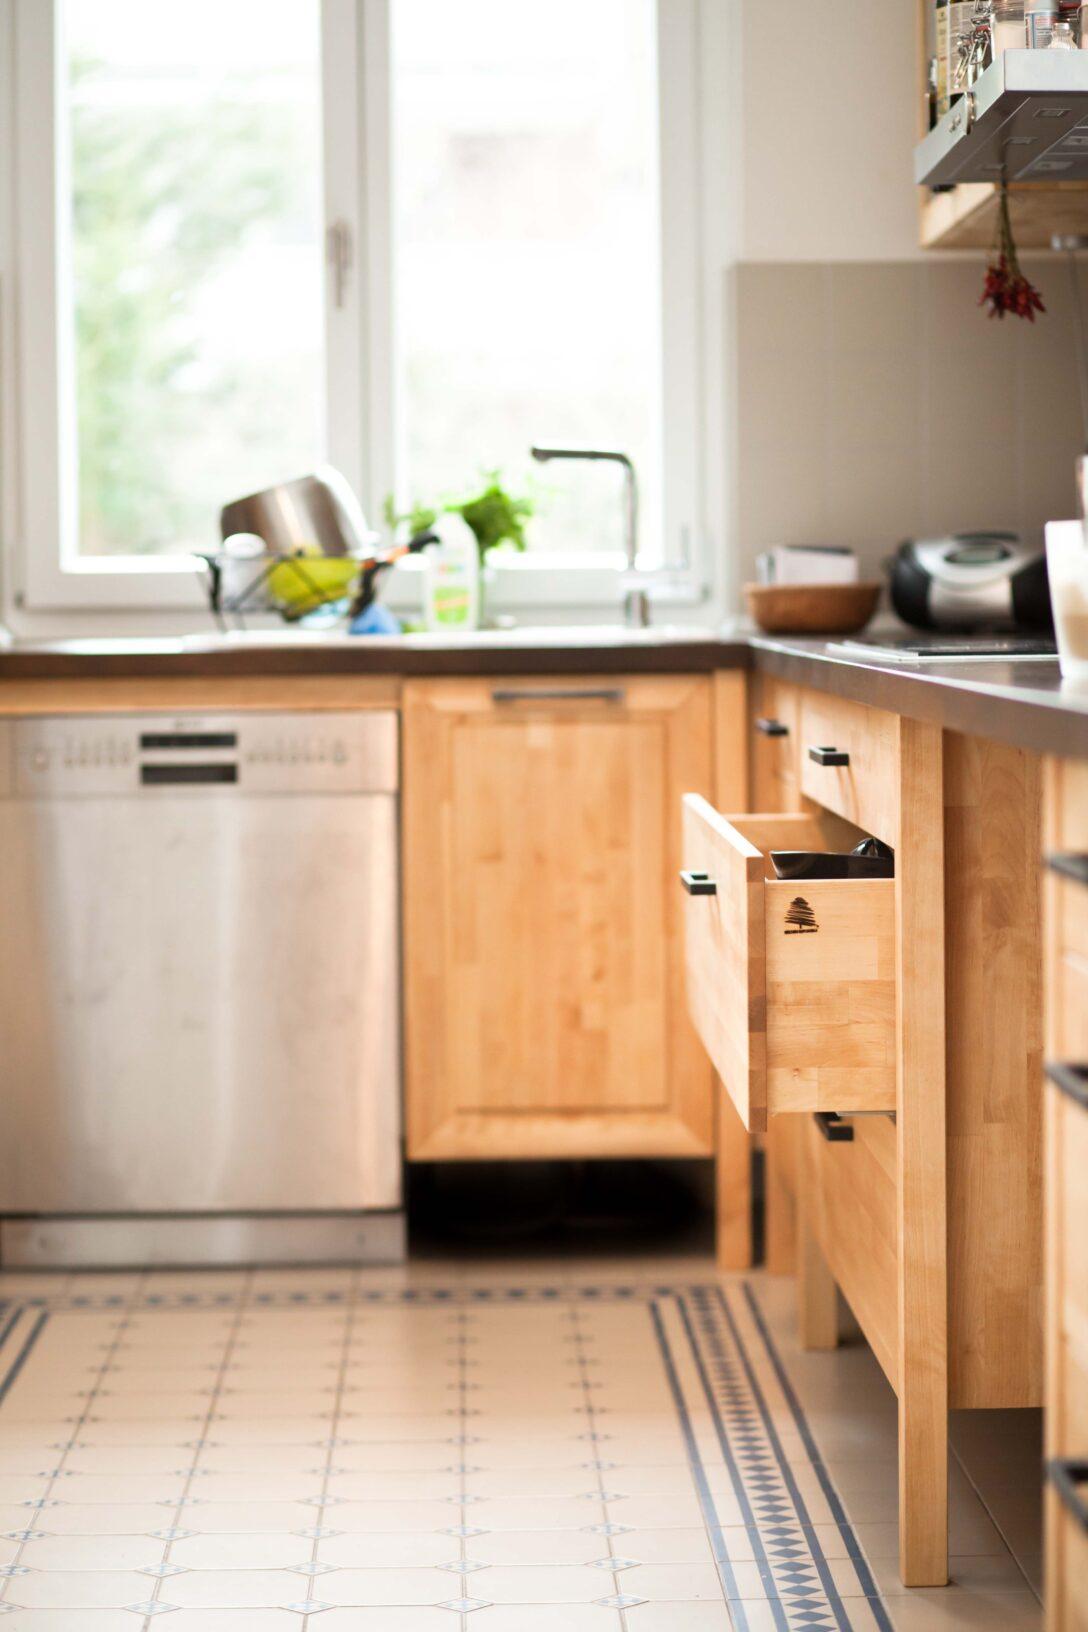 Full Size of Modulküche Ikea Holz Wohnzimmer Modulküche Cocoon